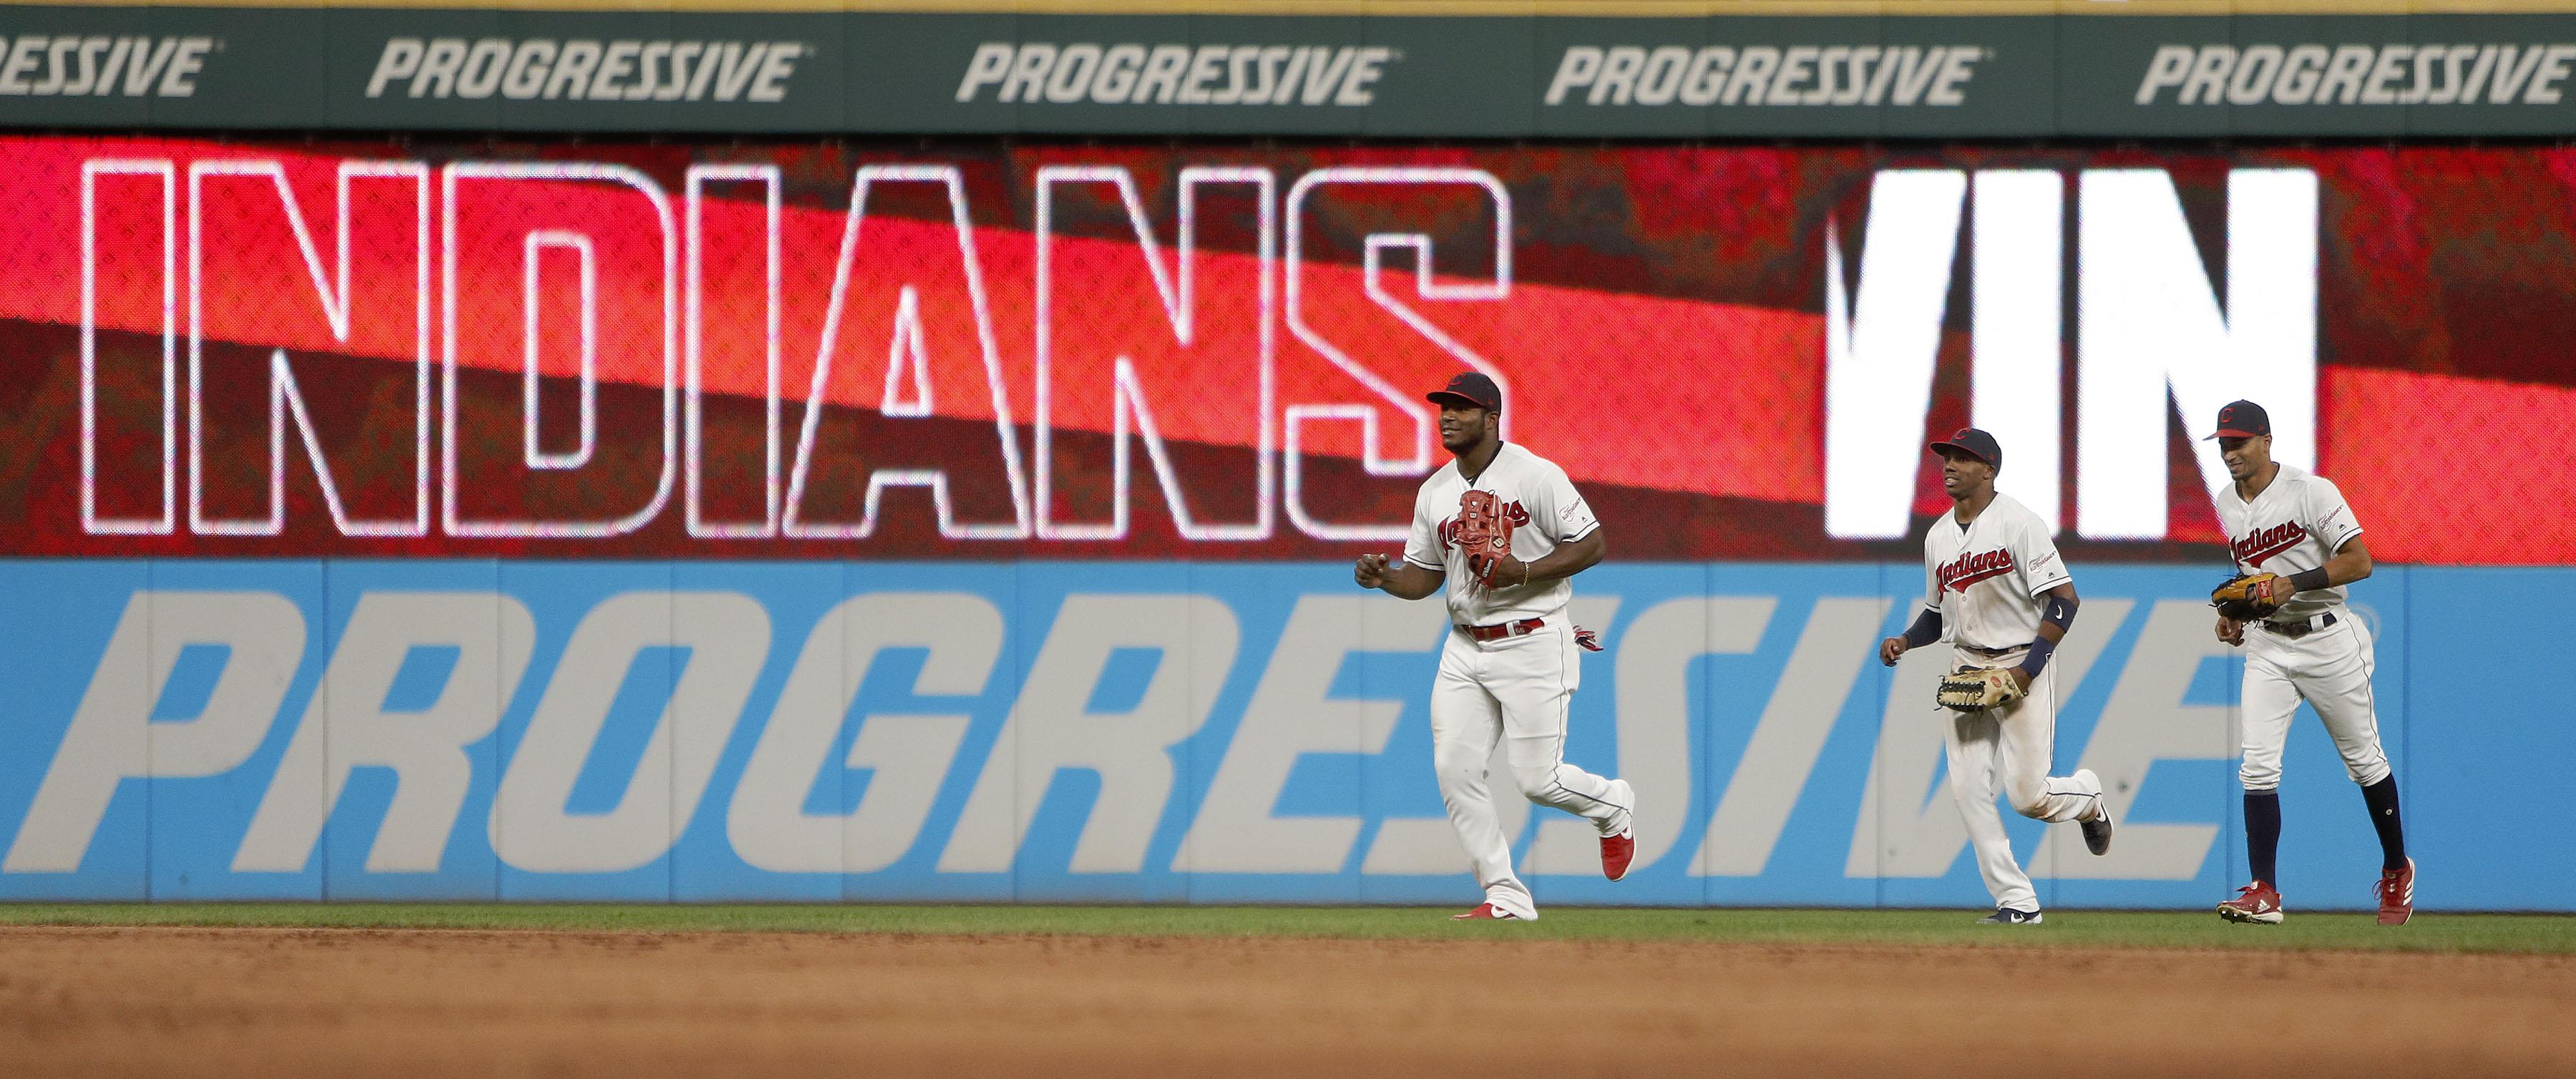 Philadelphia Phillies v Cleveland Indians